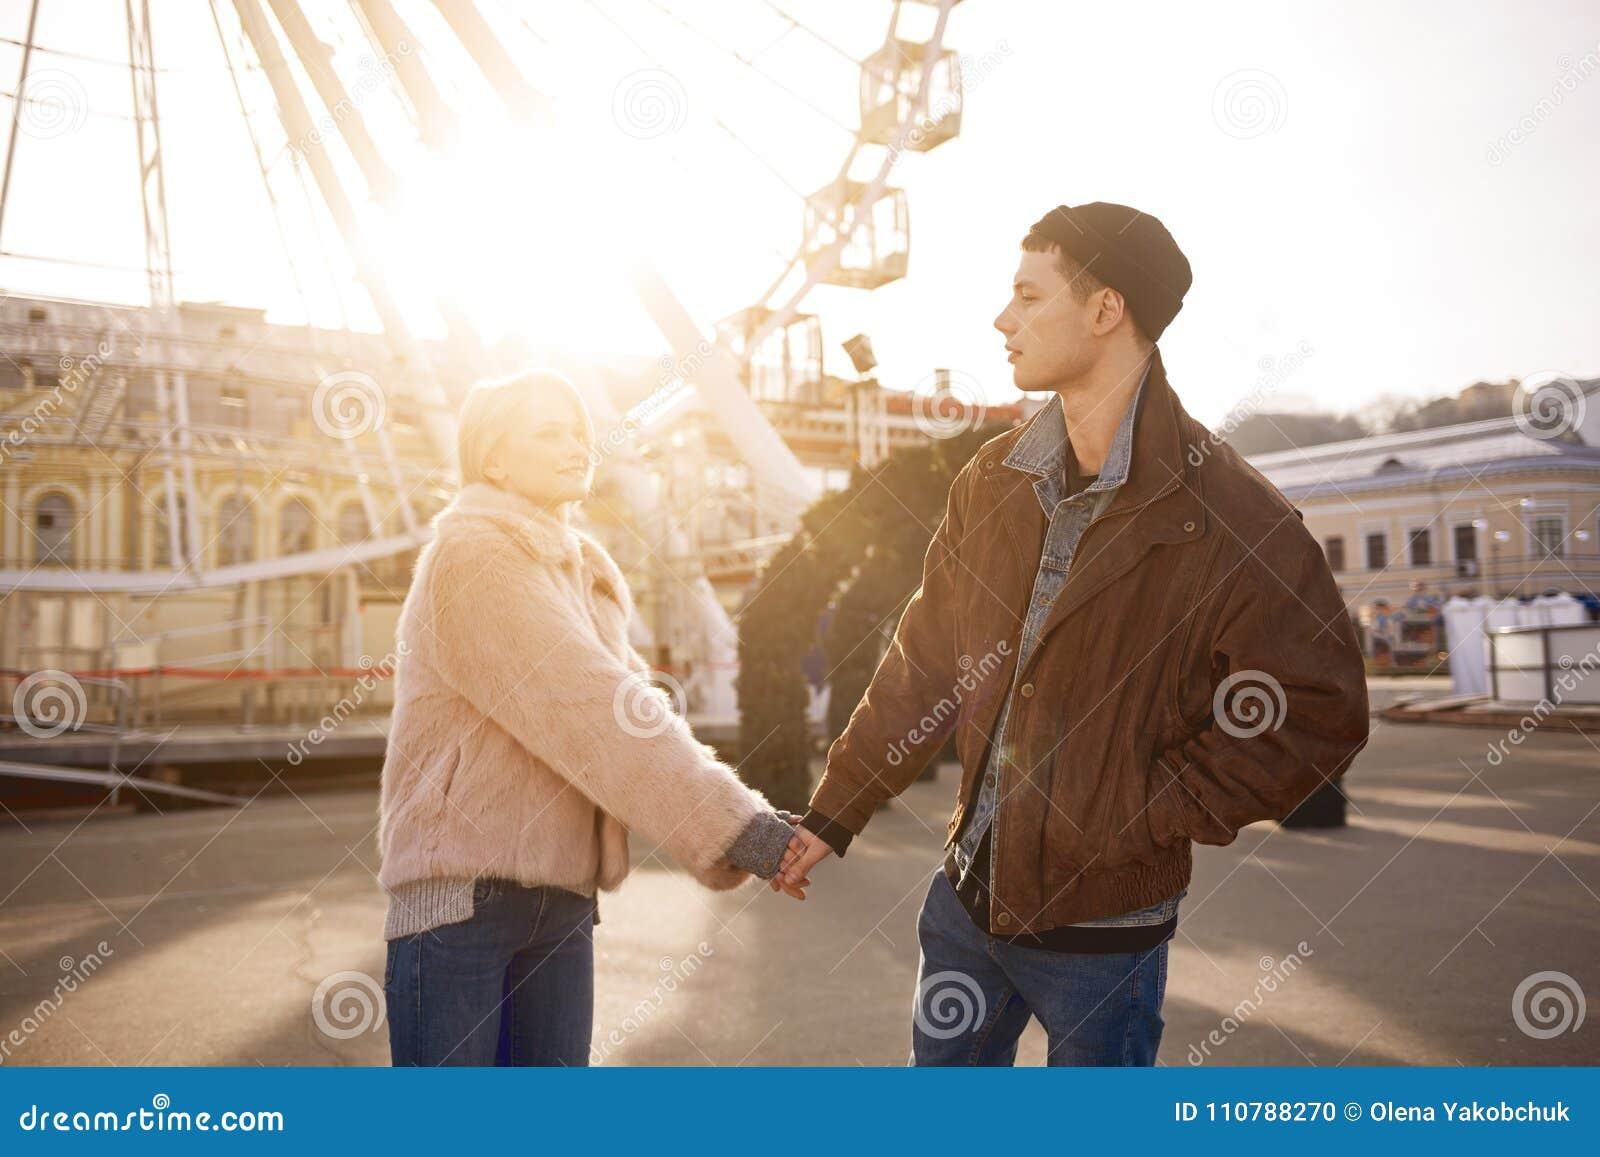 dating-a-marine-guy-binaries-young-teen